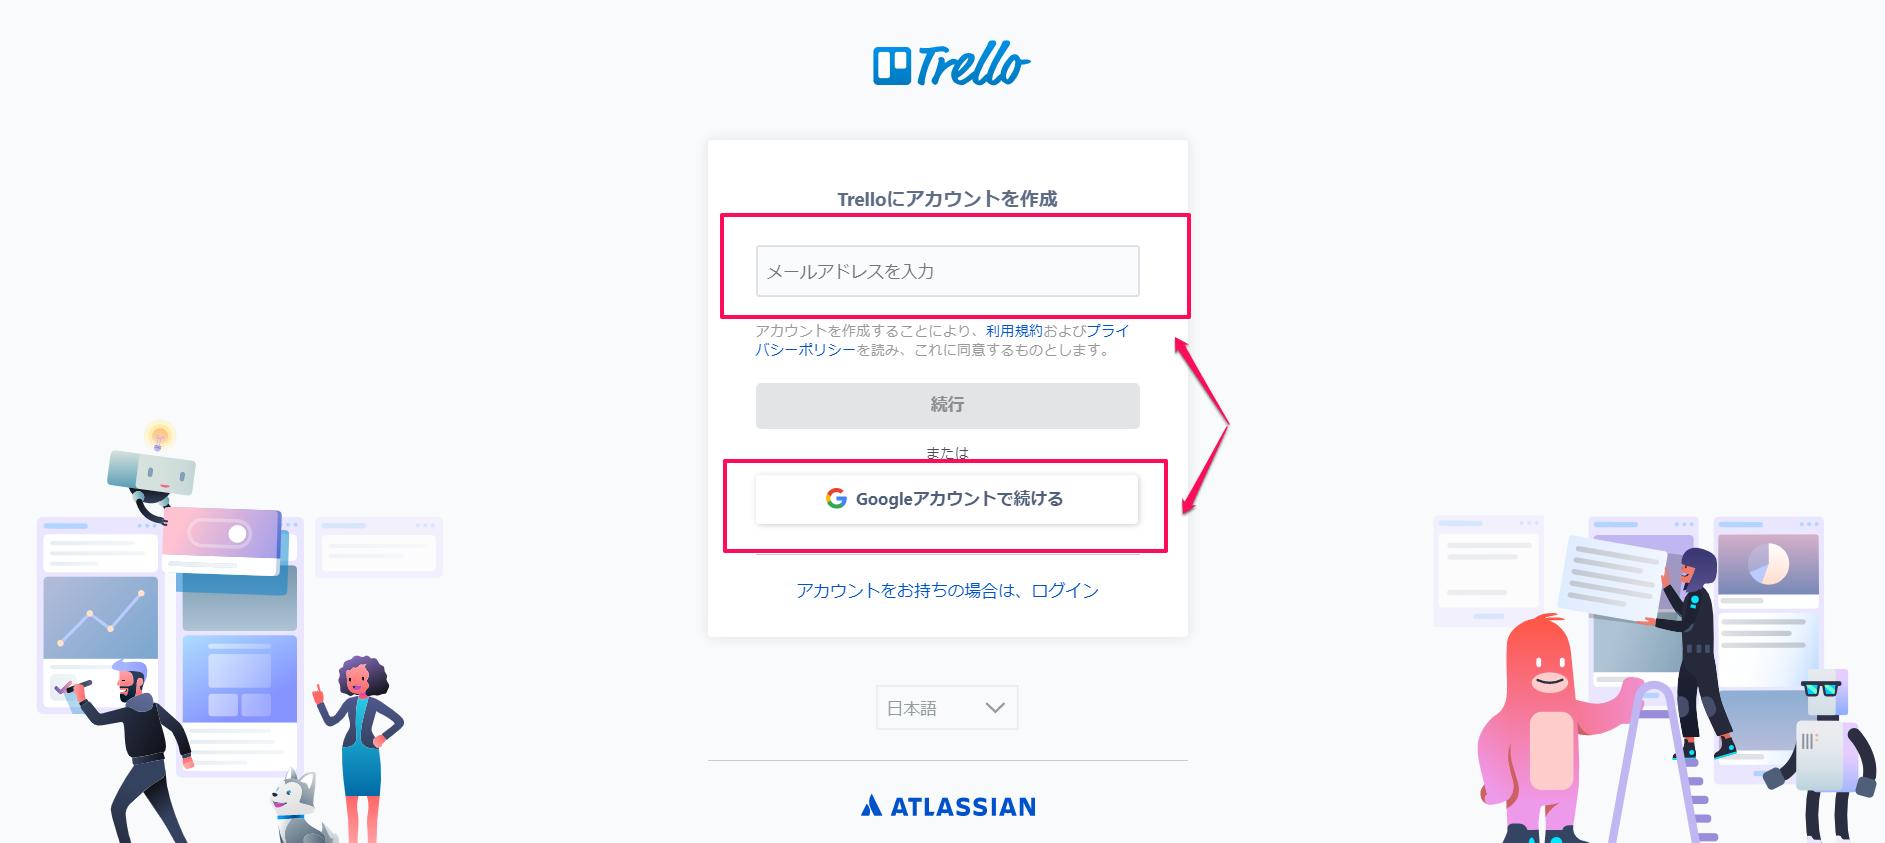 Trello(トレロ)の登録方法